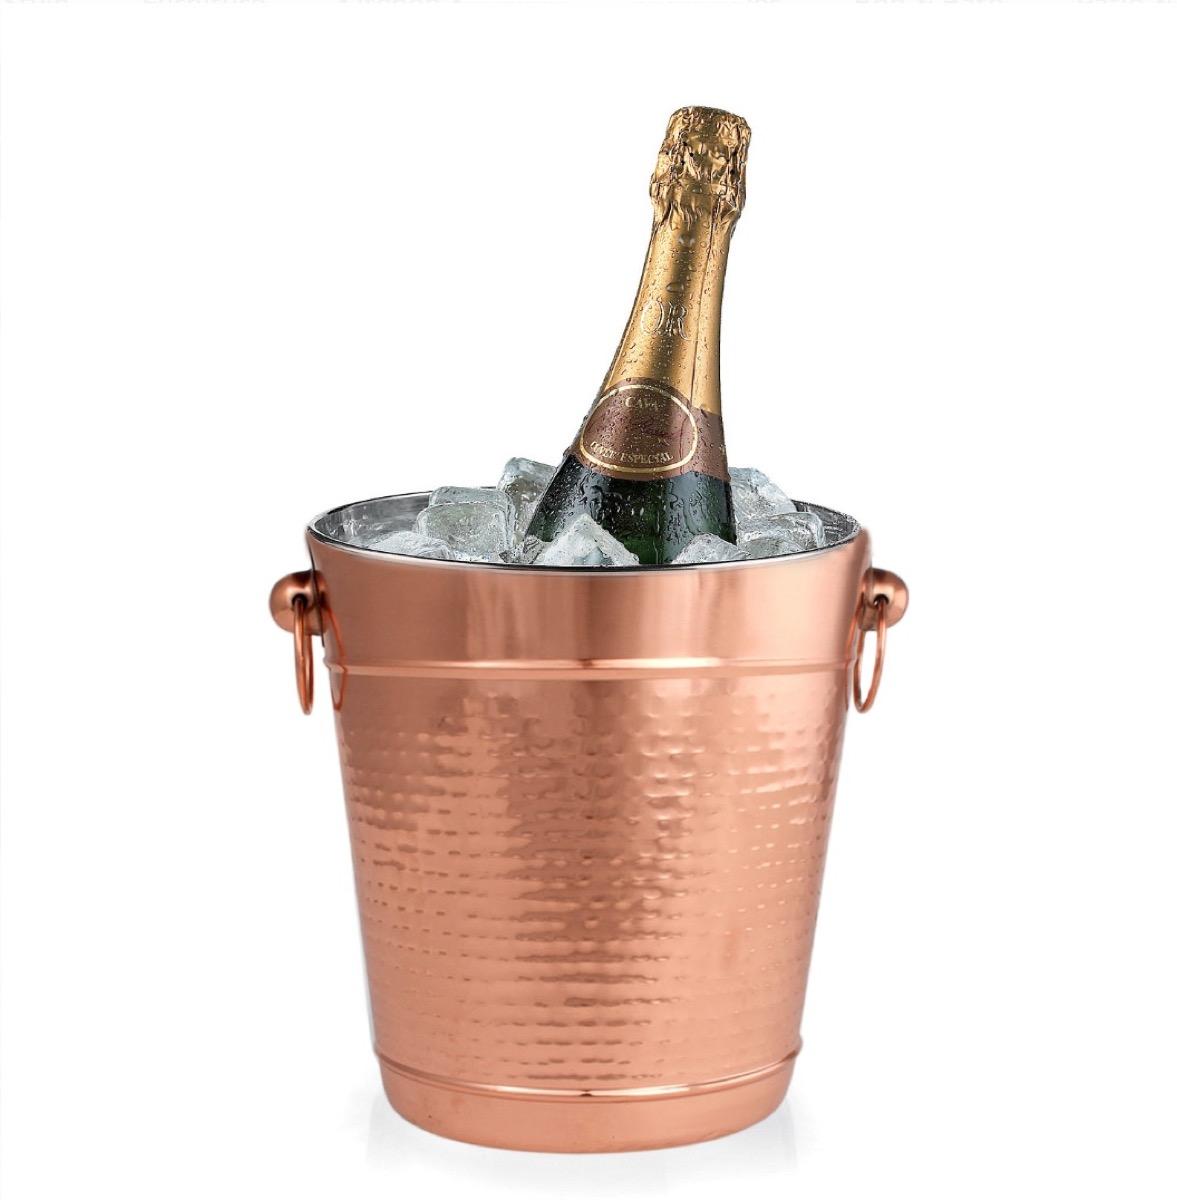 hammered copper champagne bucket, summer party essentials